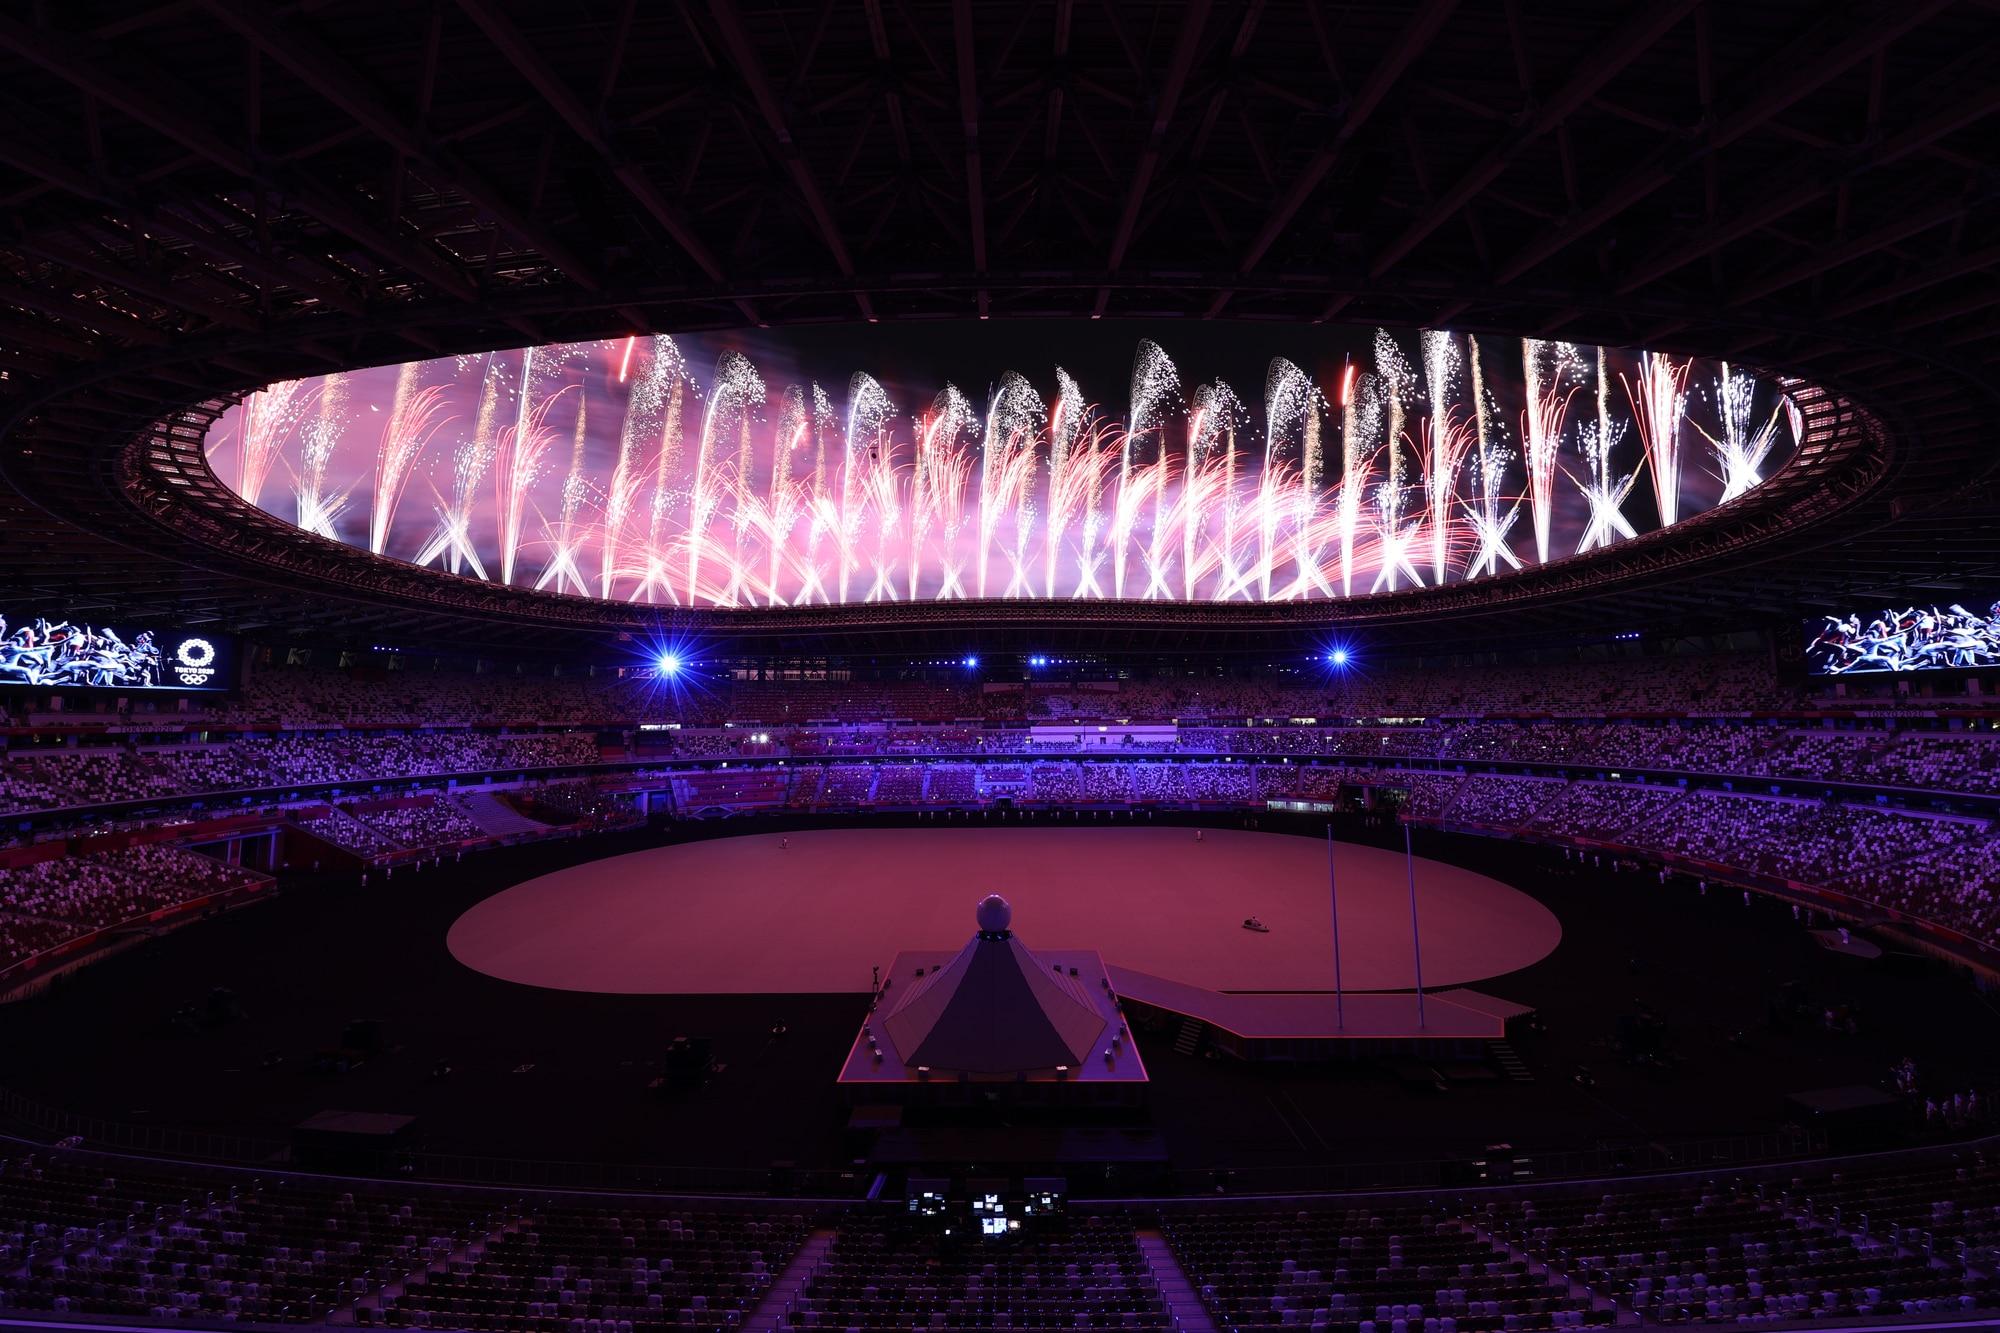 Olimpiadi, le spettacolari foto della cerimonia d'apertura